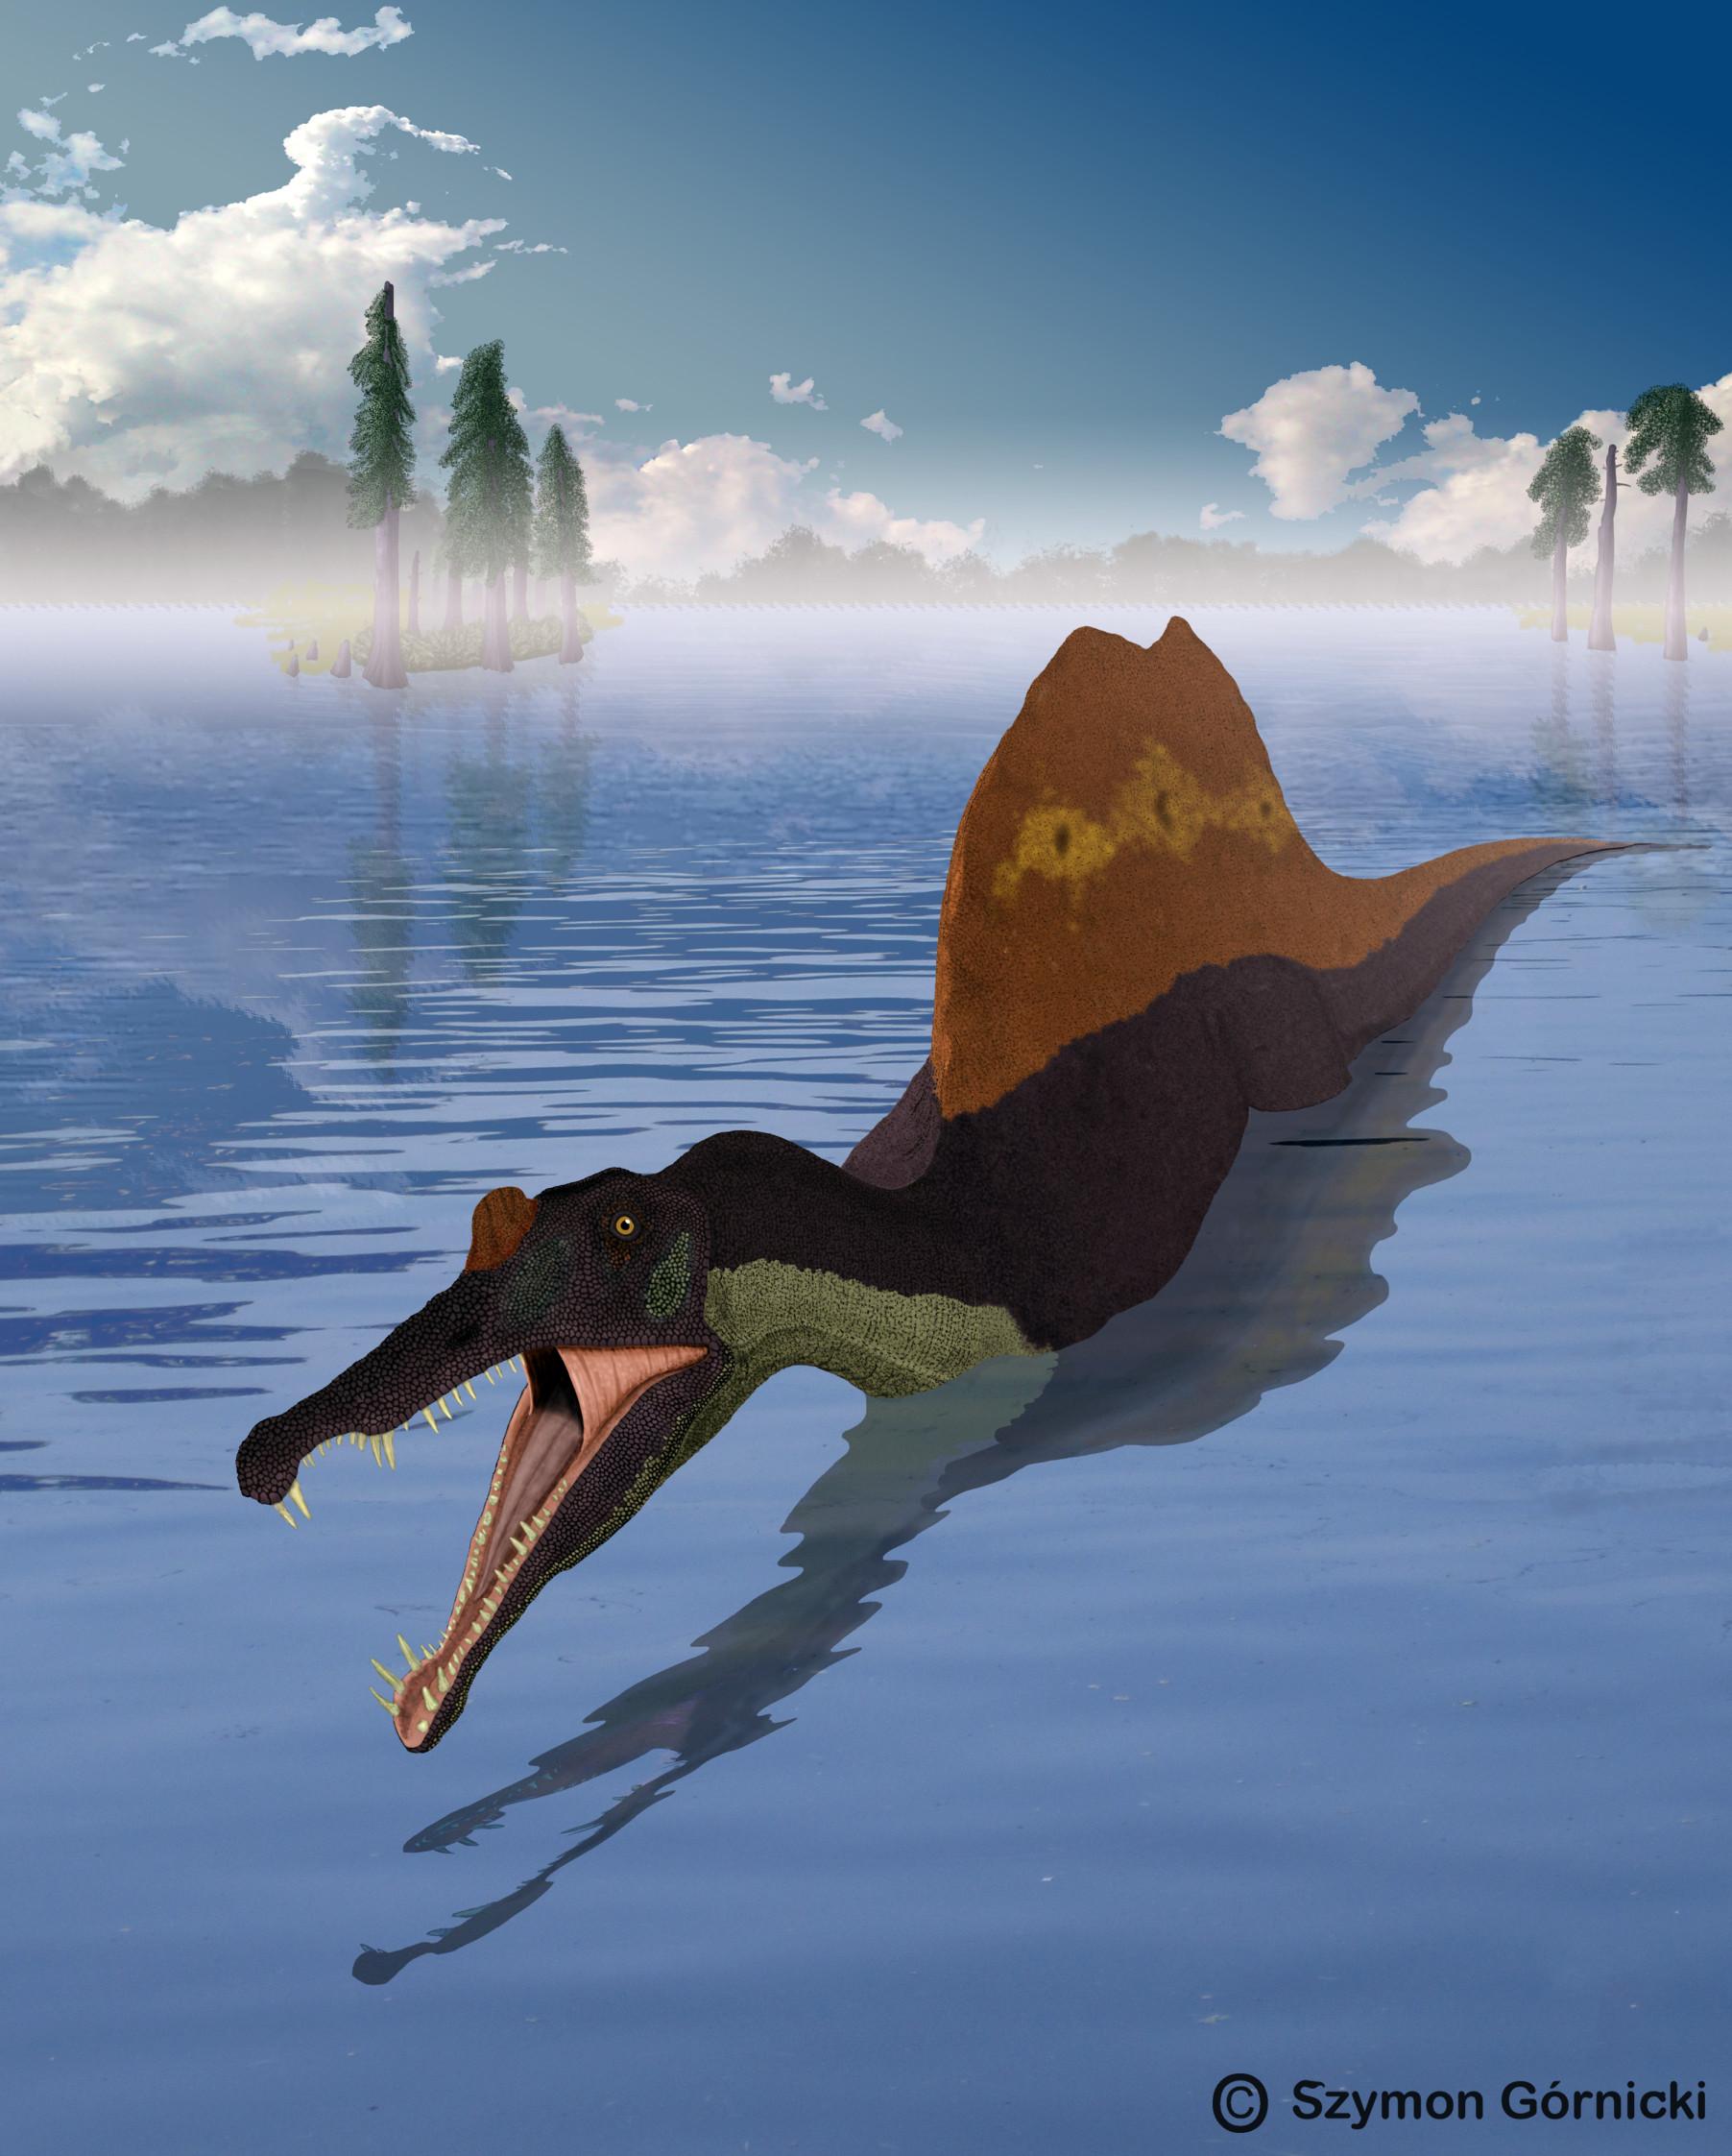 Spinosaurus in deeper water.